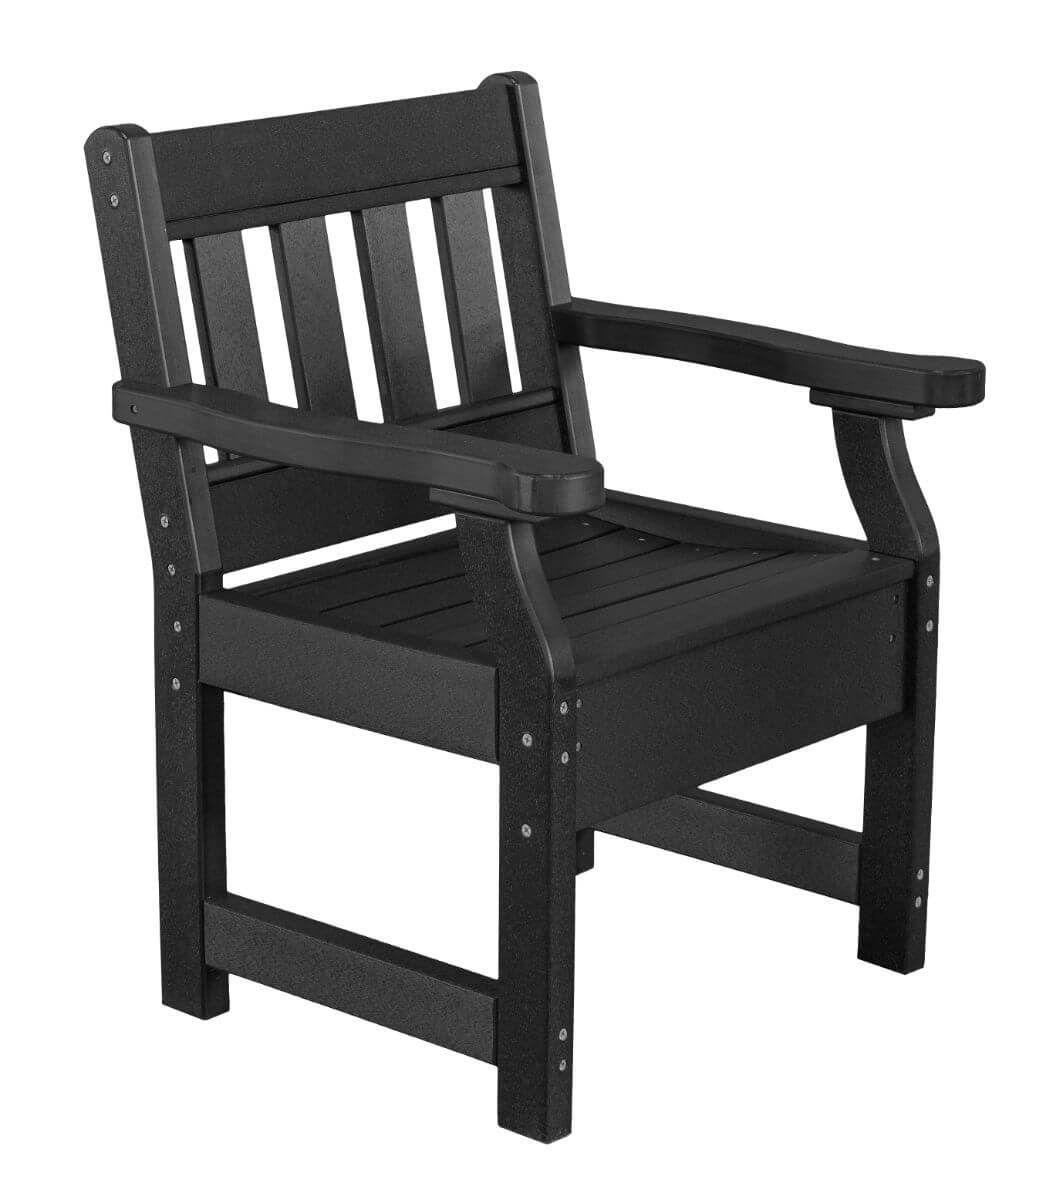 Black Aden Patio Chair